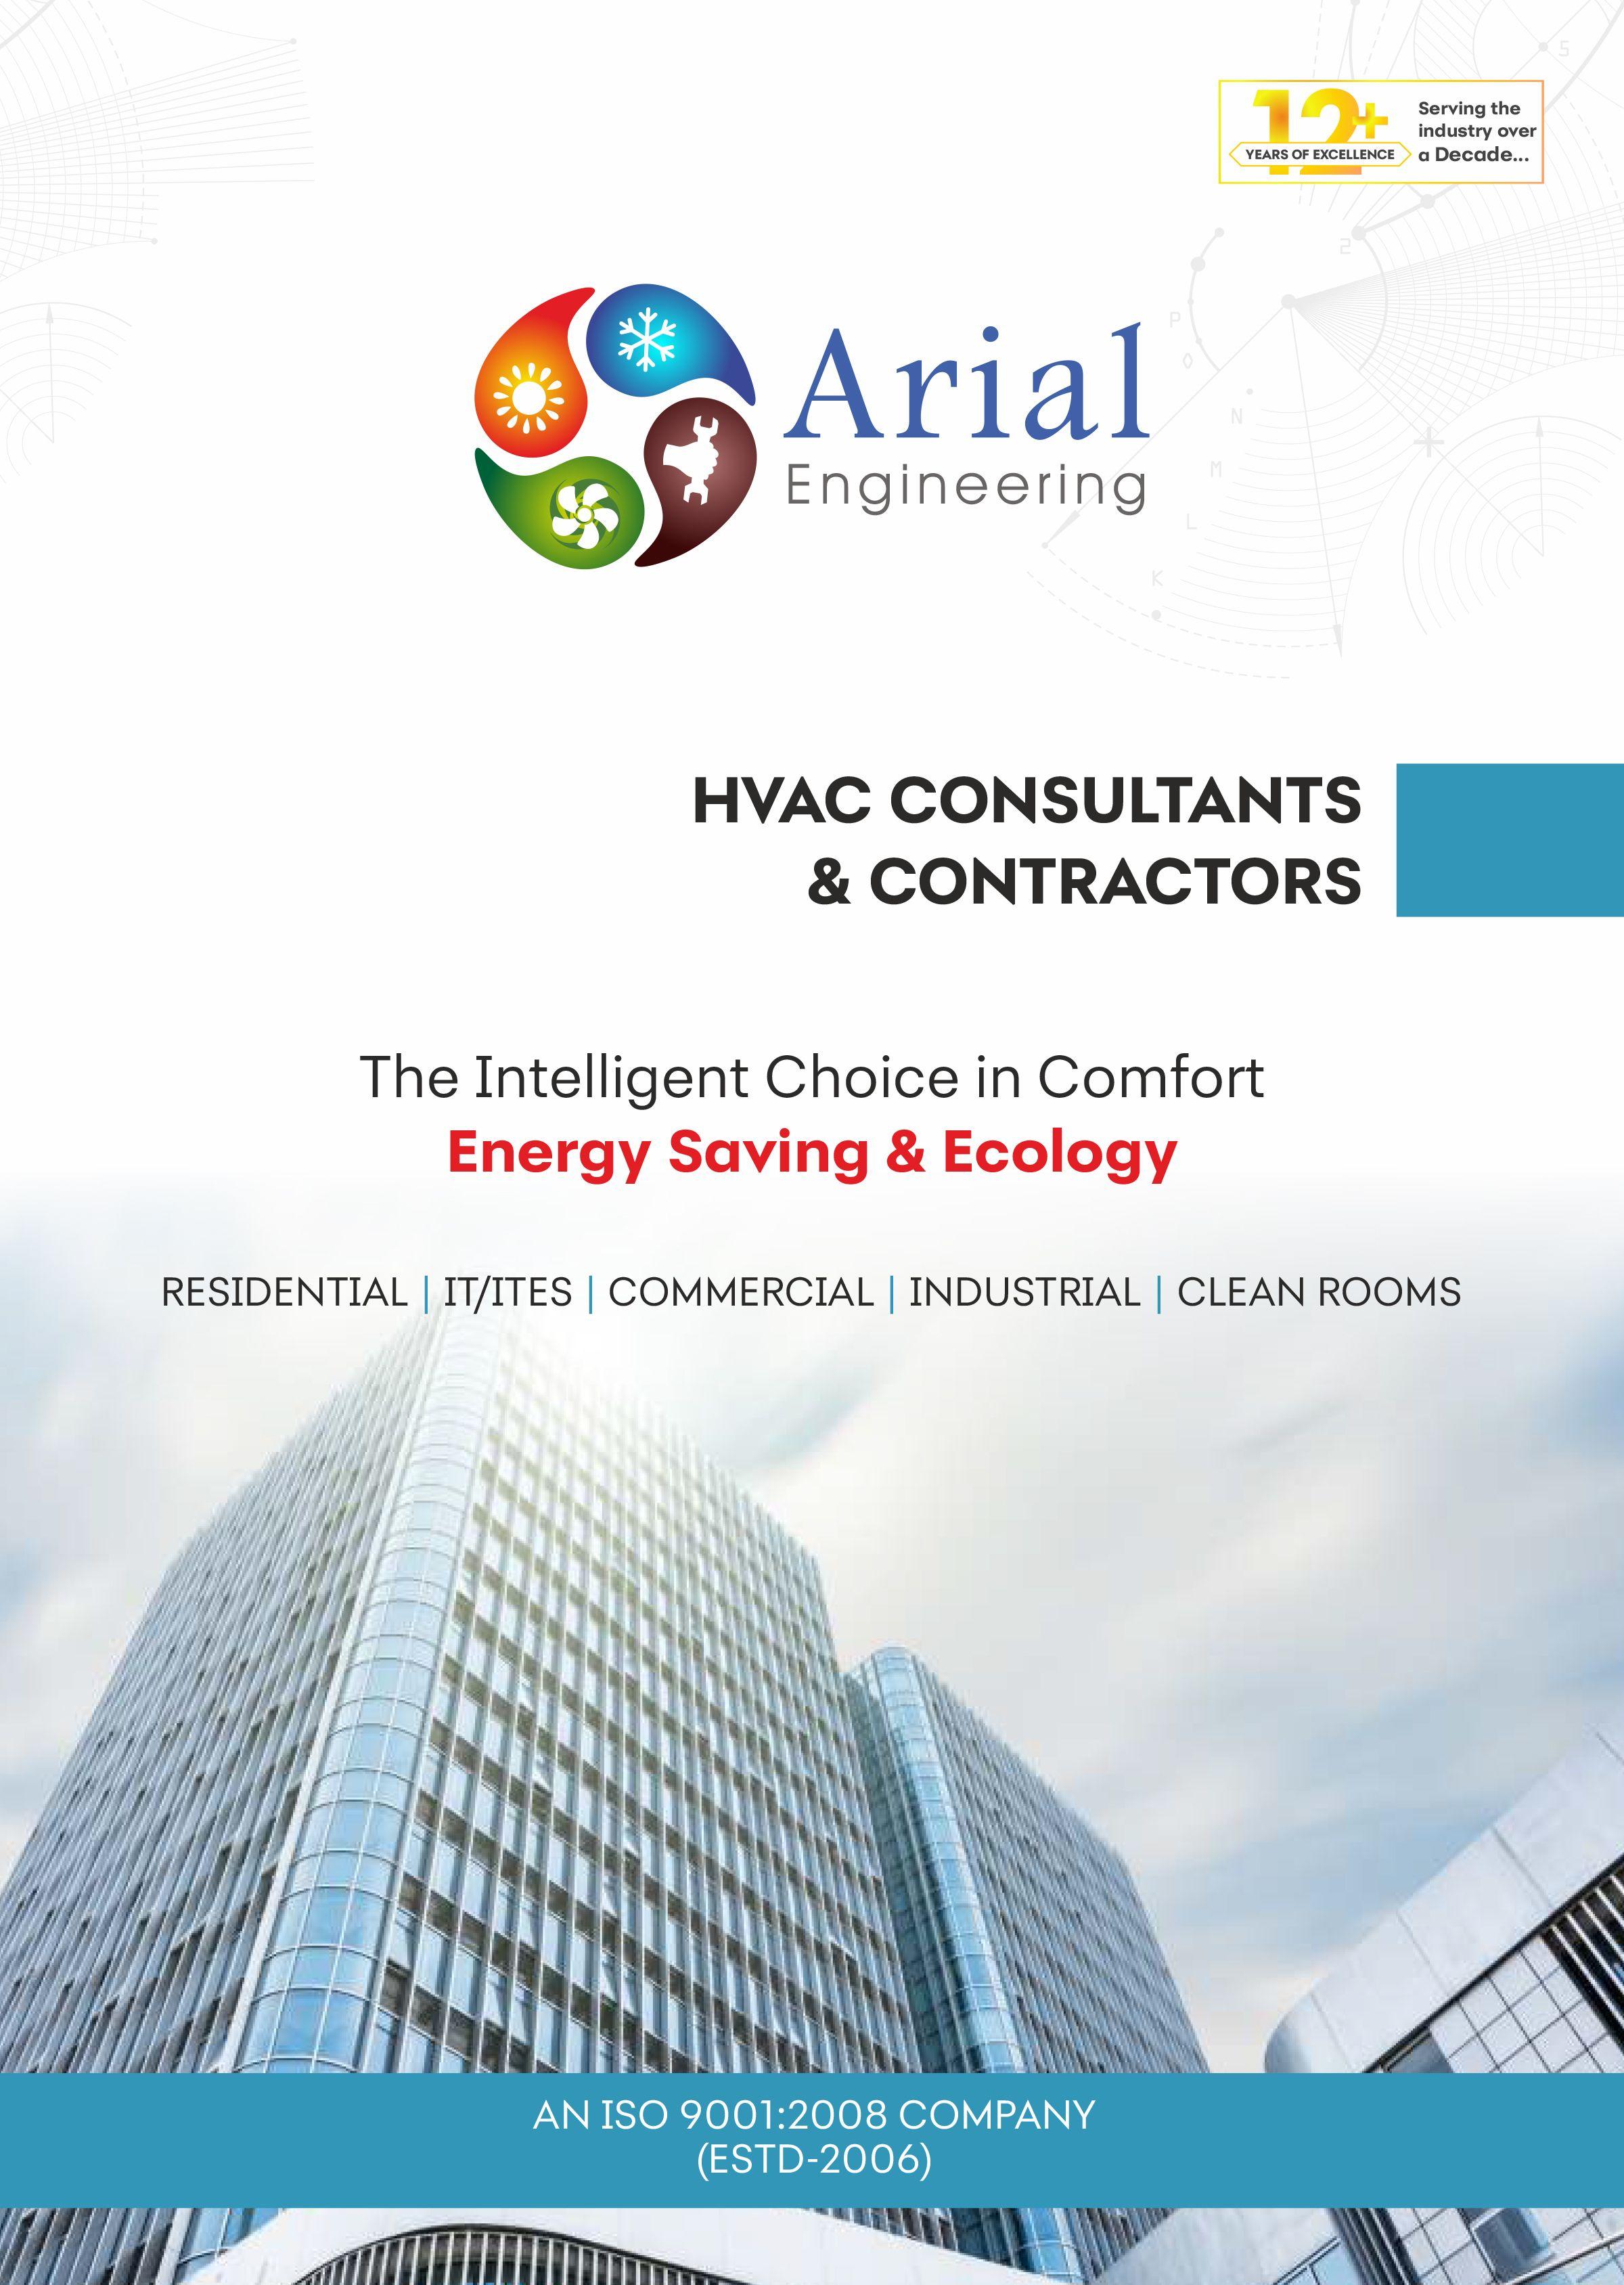 medium resolution of company brochure arial engineering services